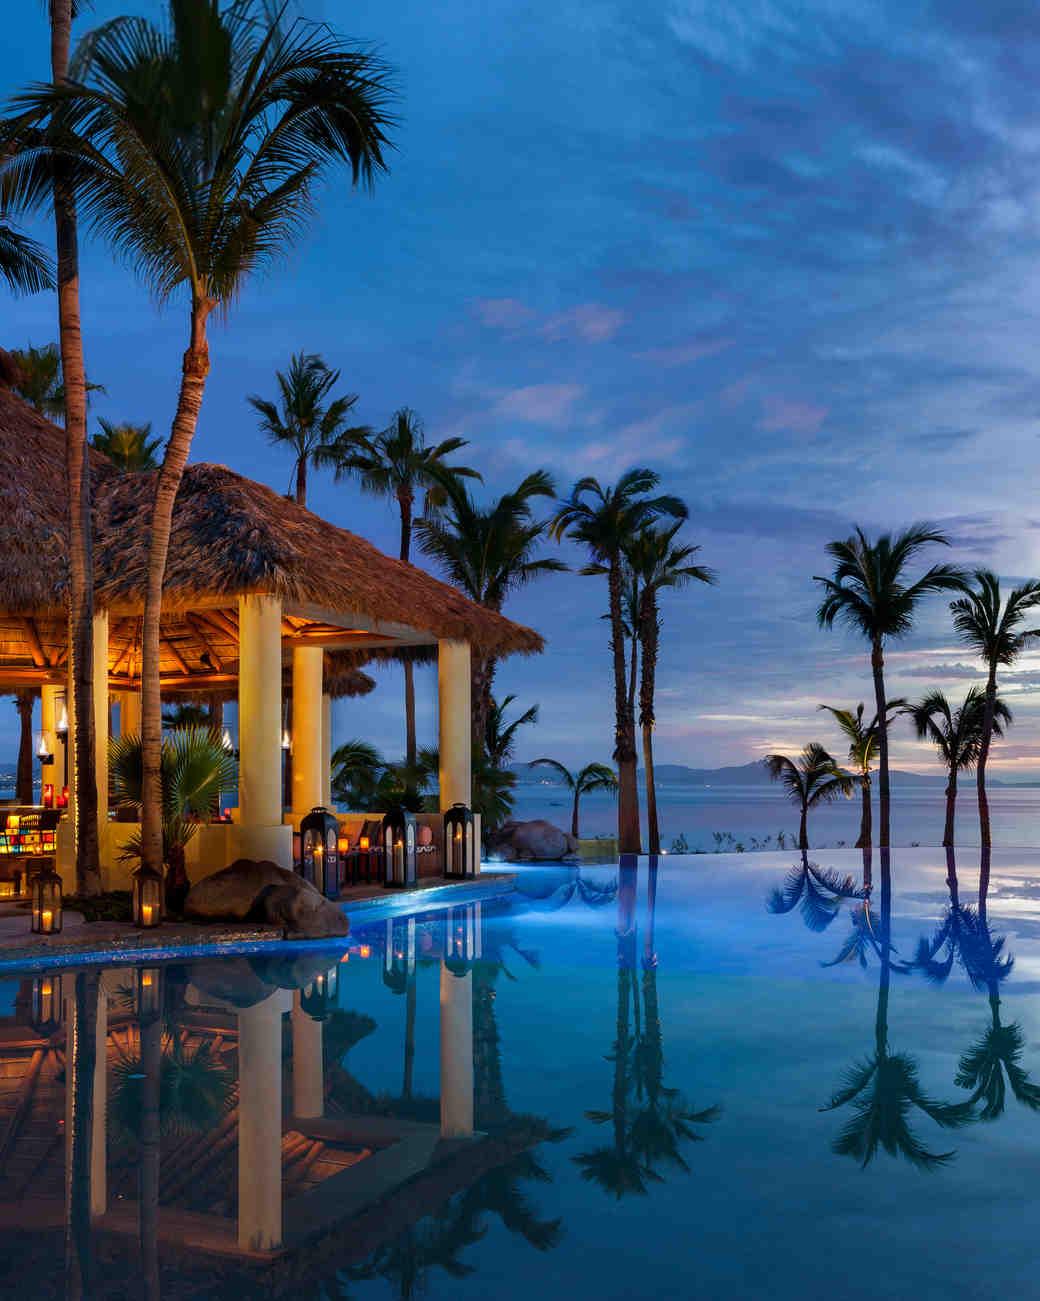 8 cool new hotels in classic honeymoon spots | martha stewart weddings